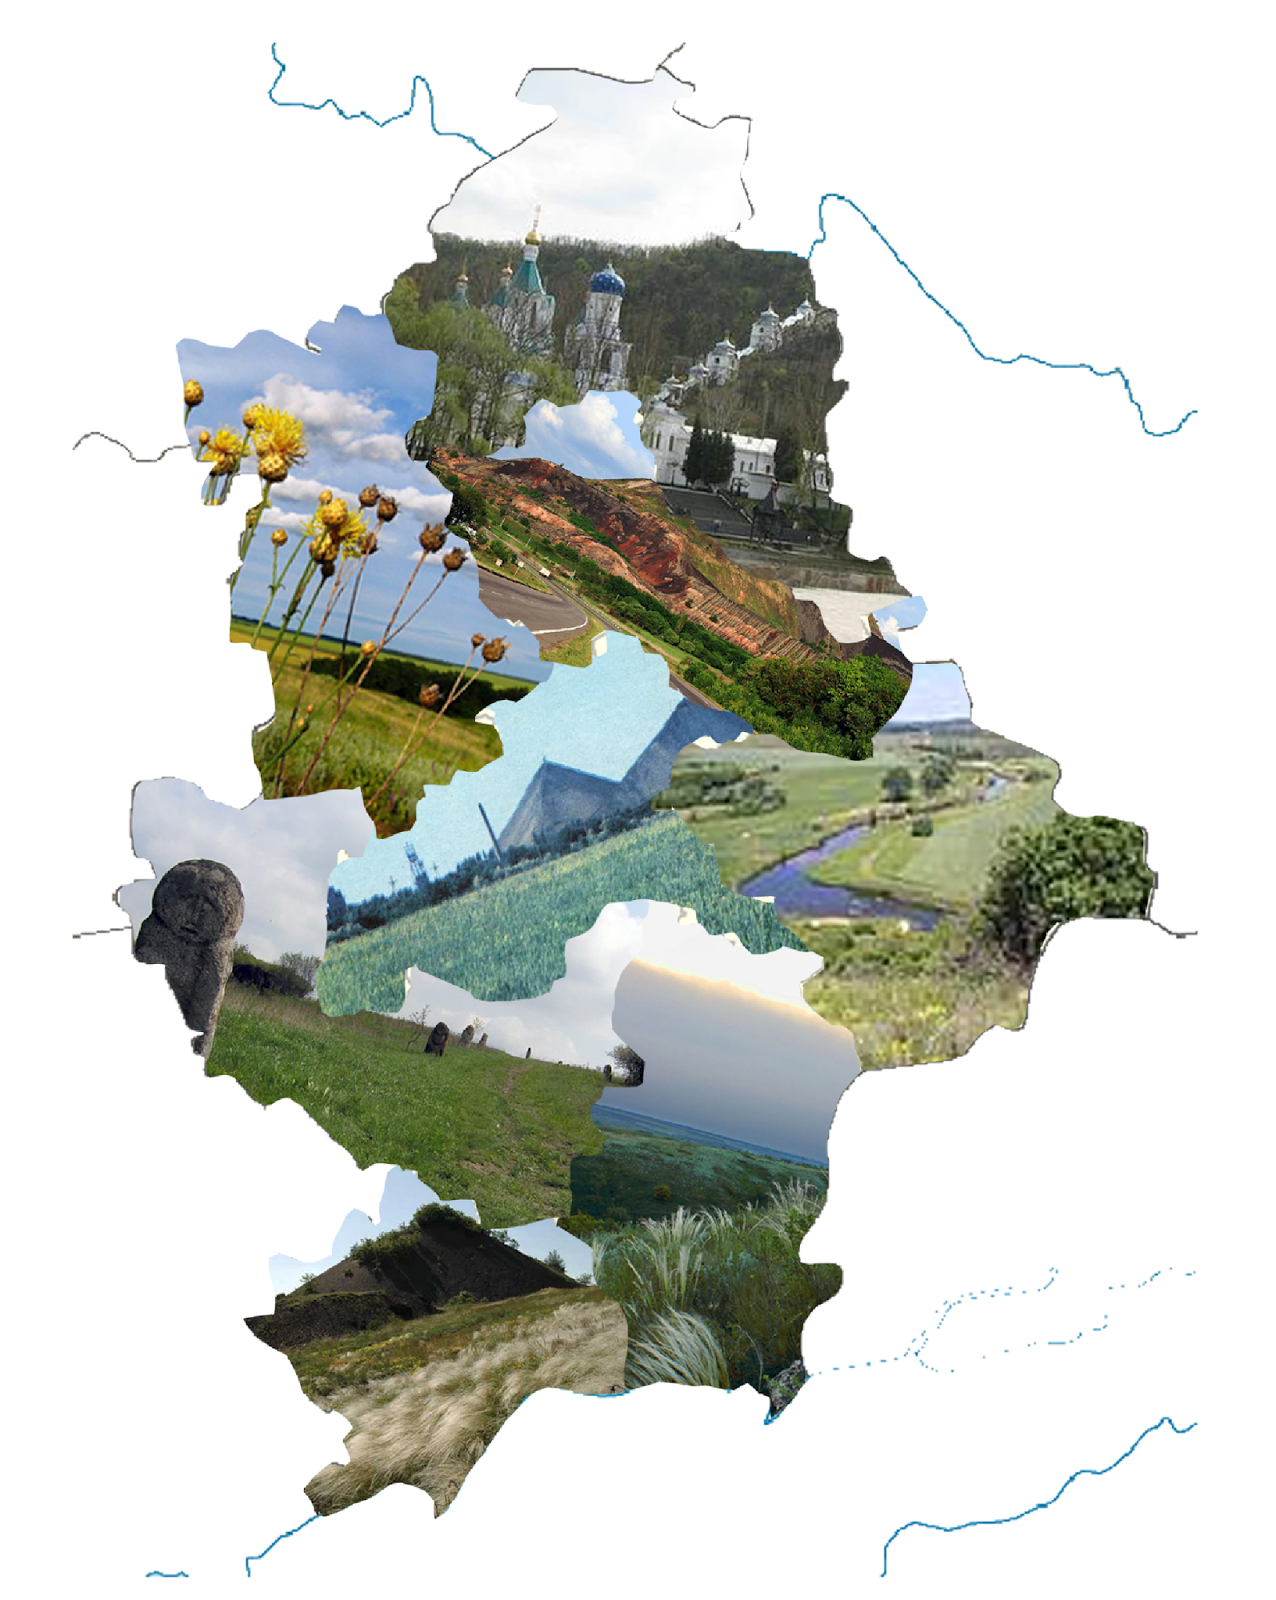 Учебник по Географии 8 Класс Панкина